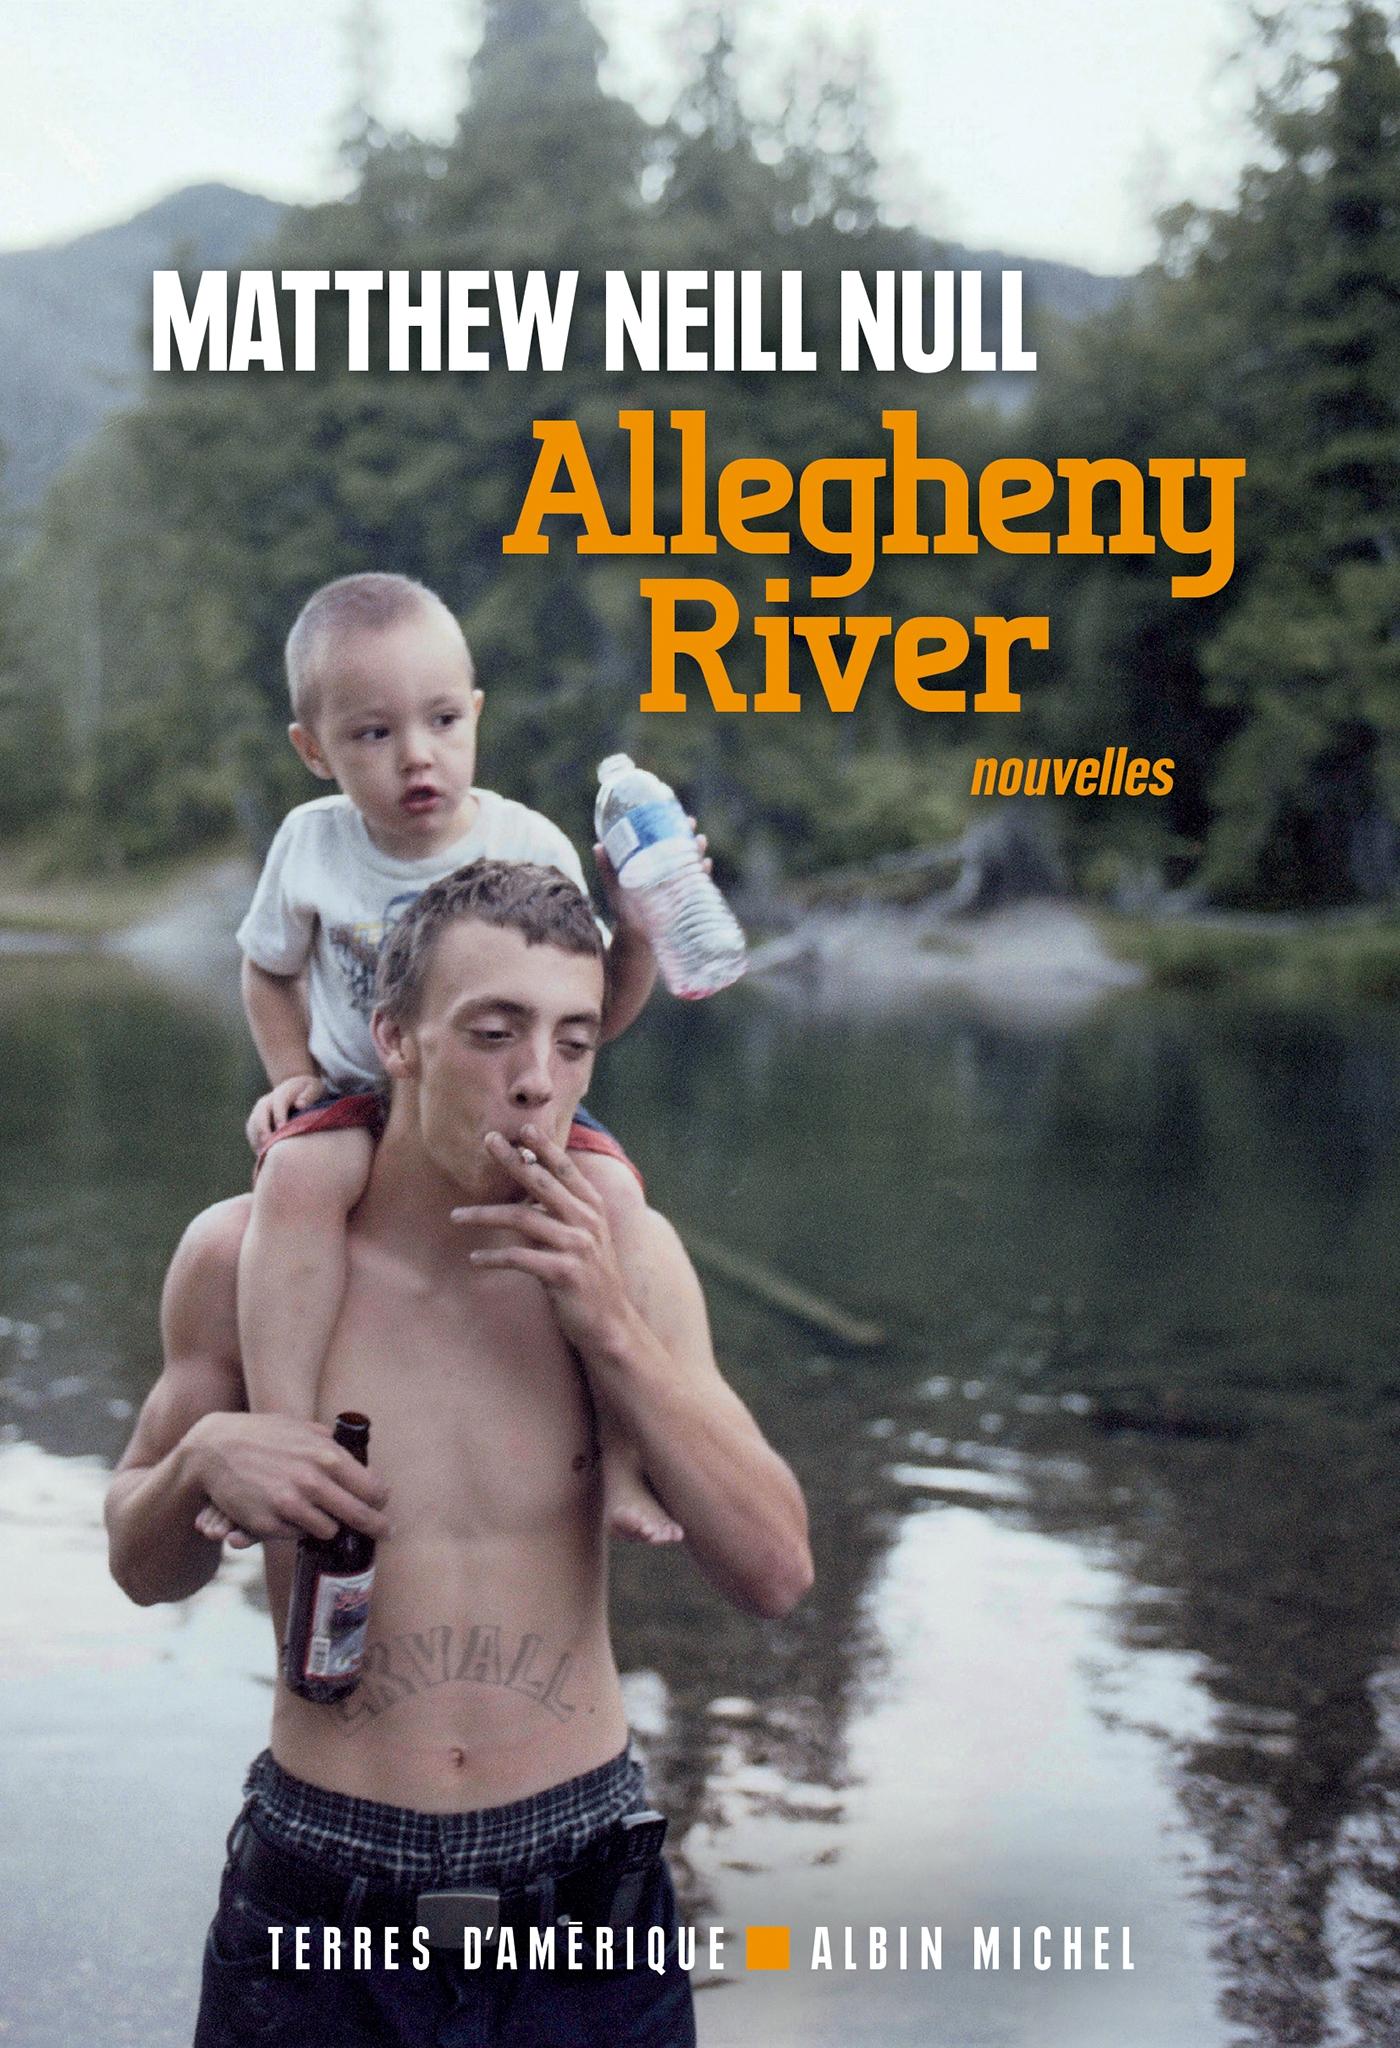 Allegheny River | Neill Null, Matthew. Auteur